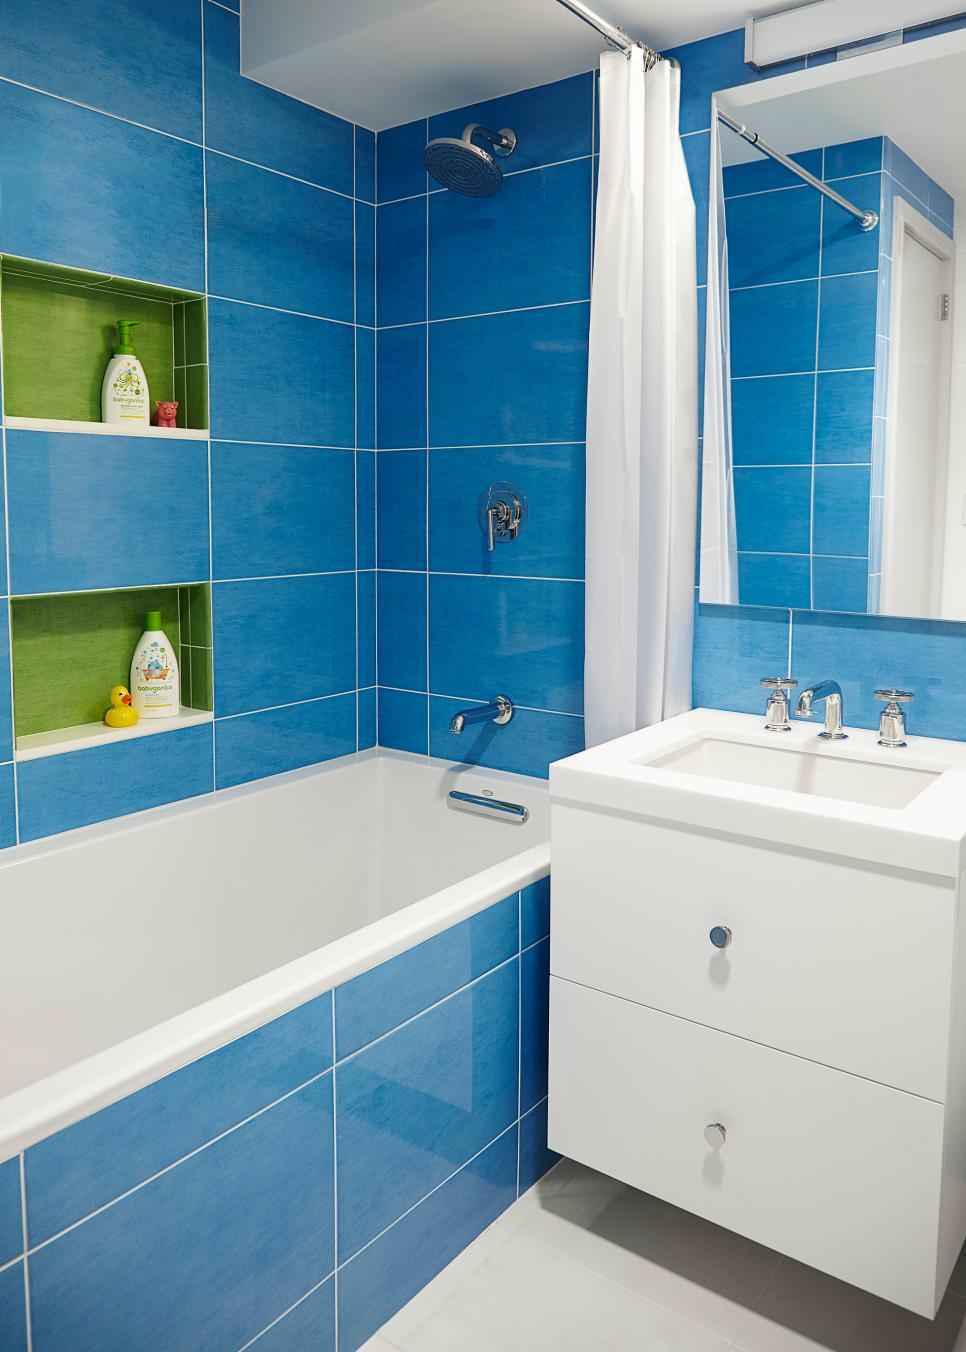 Amazing Blue Tiled Bathroom Design